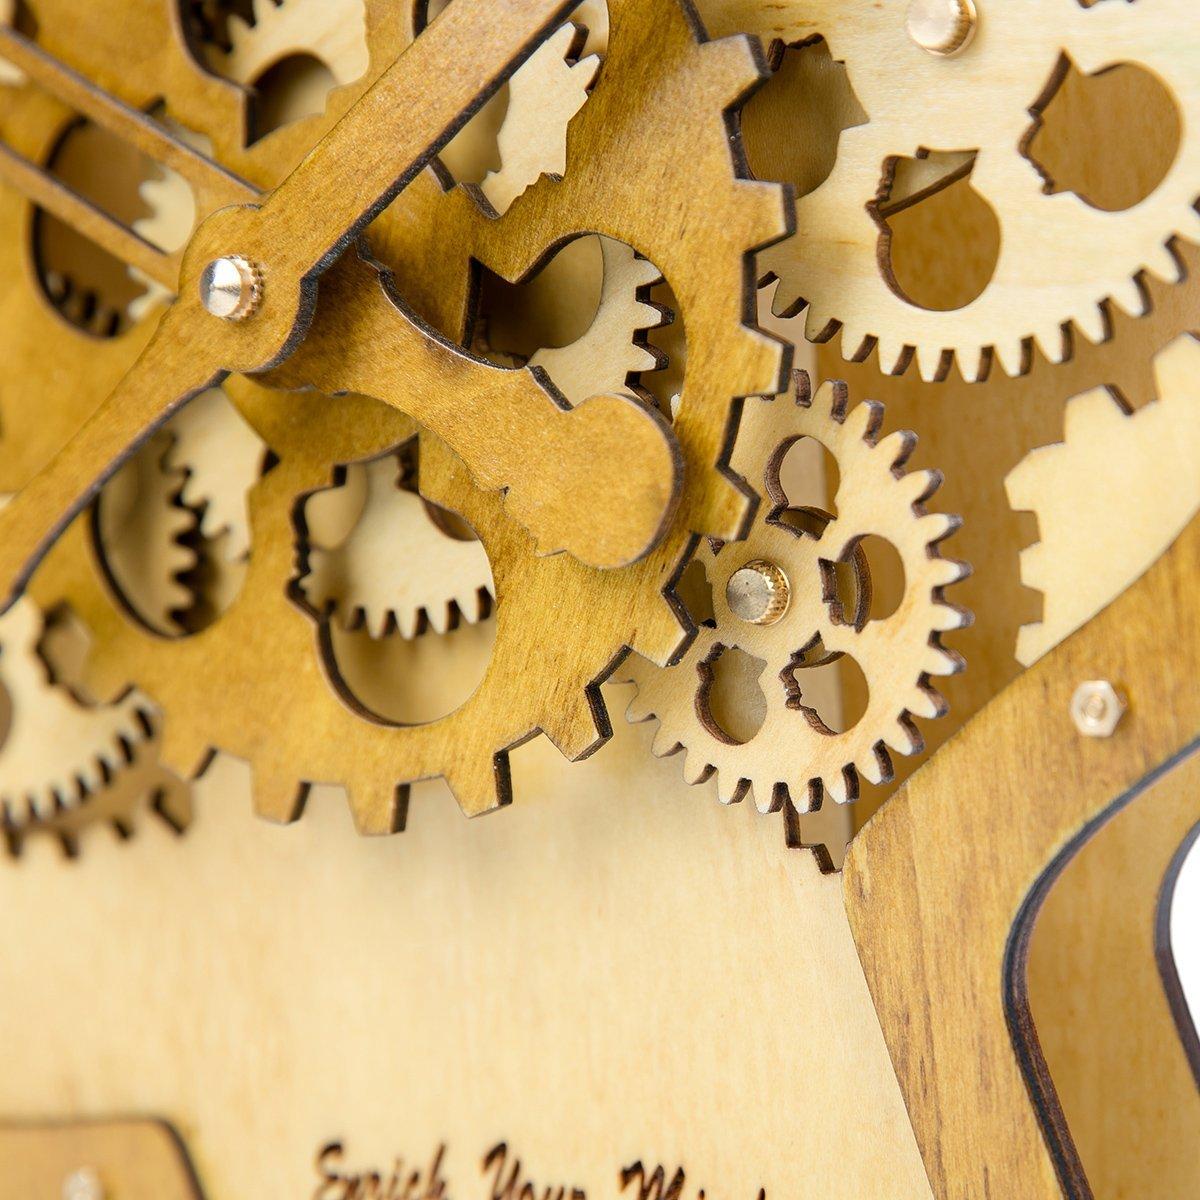 Amazon.com: Kintrot Moving Gear Clock 3D Brain Head Model Retro ...